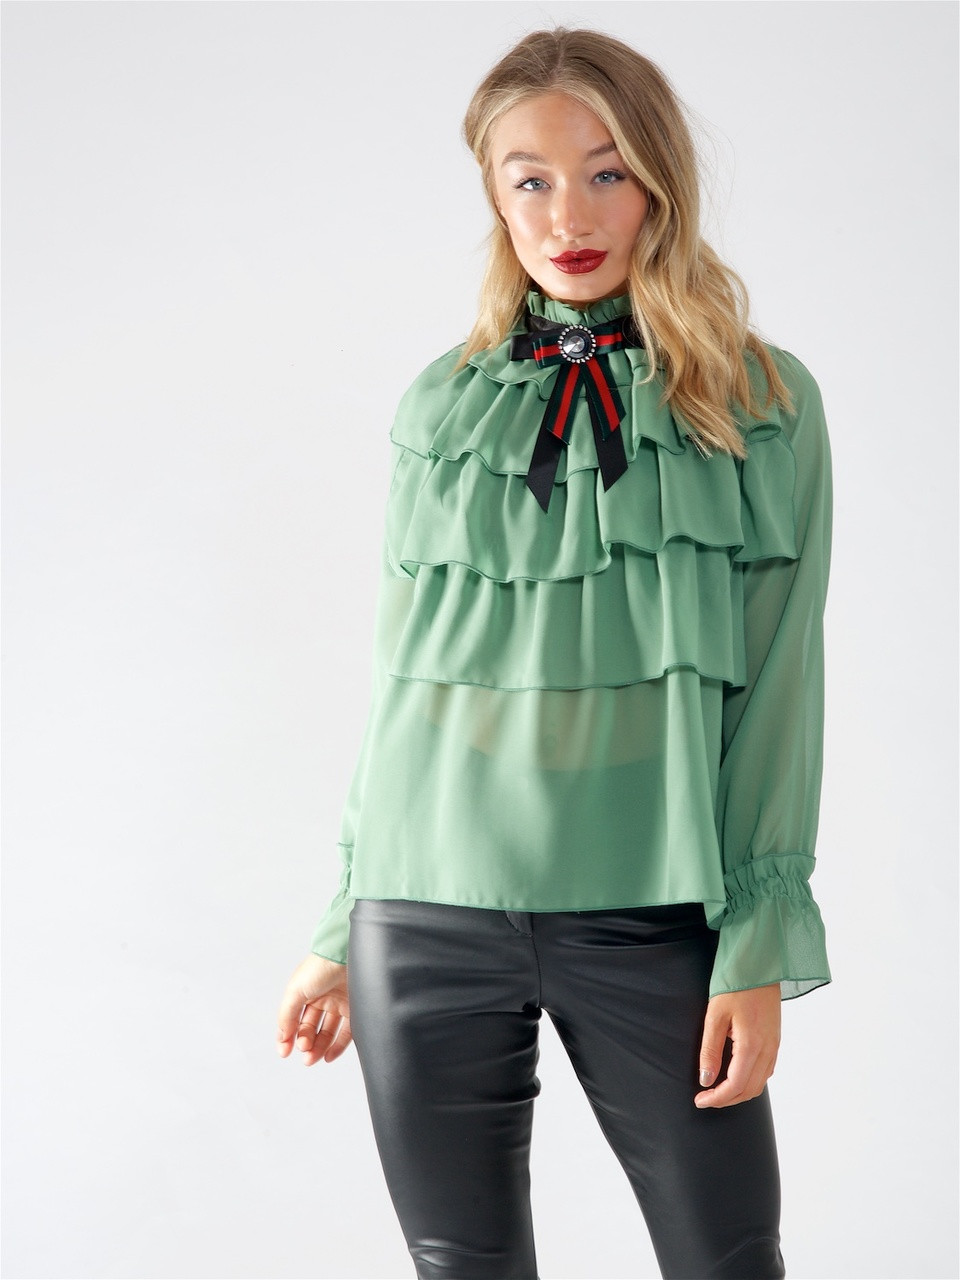 Green High Neck Layered Ruffle Blouse